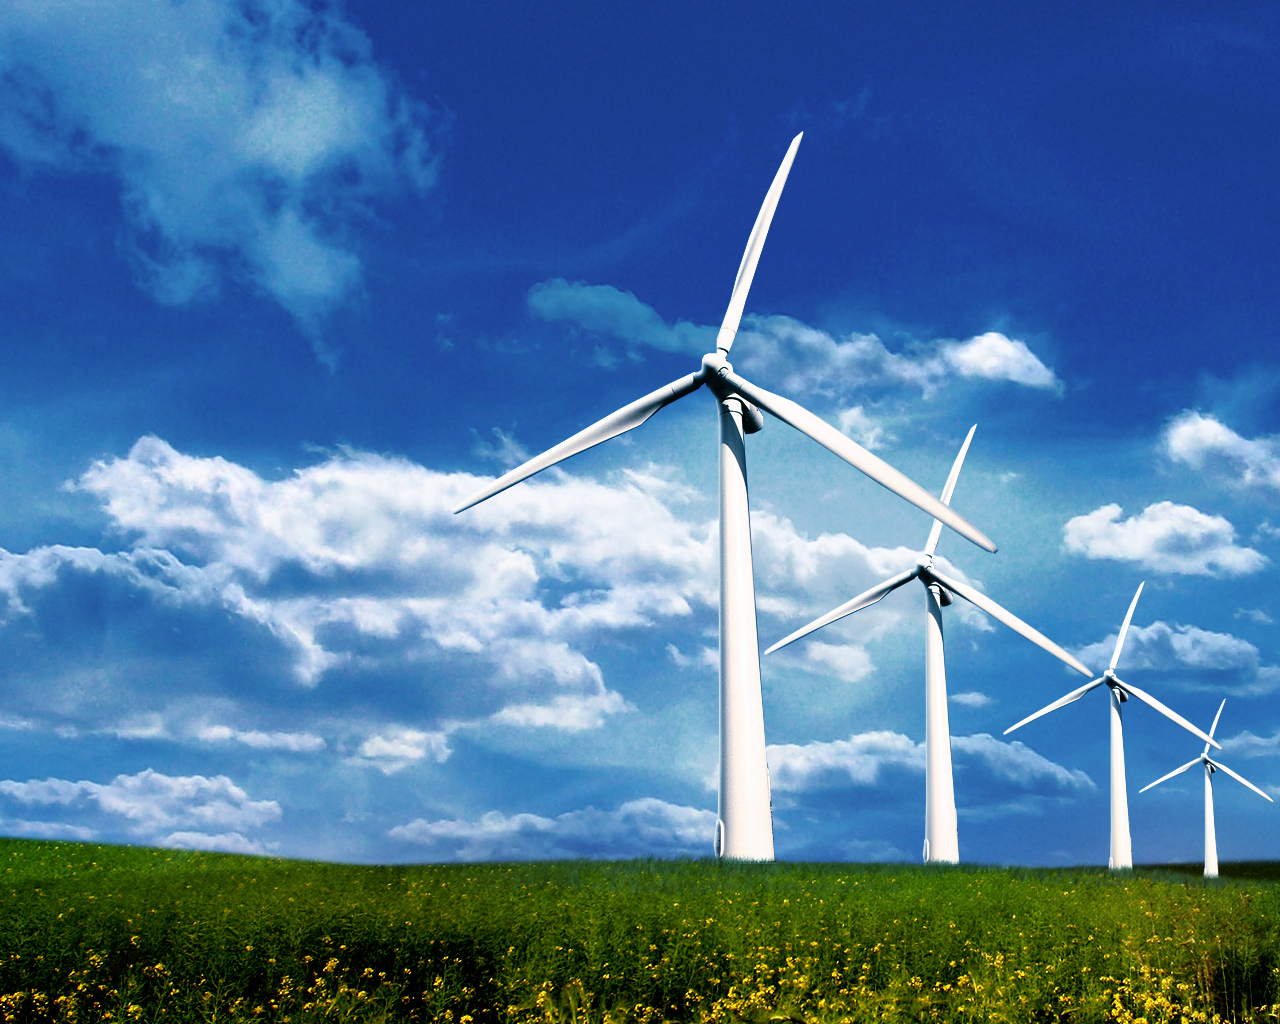 Windfarm Trusina: Investment of 150 Million KM